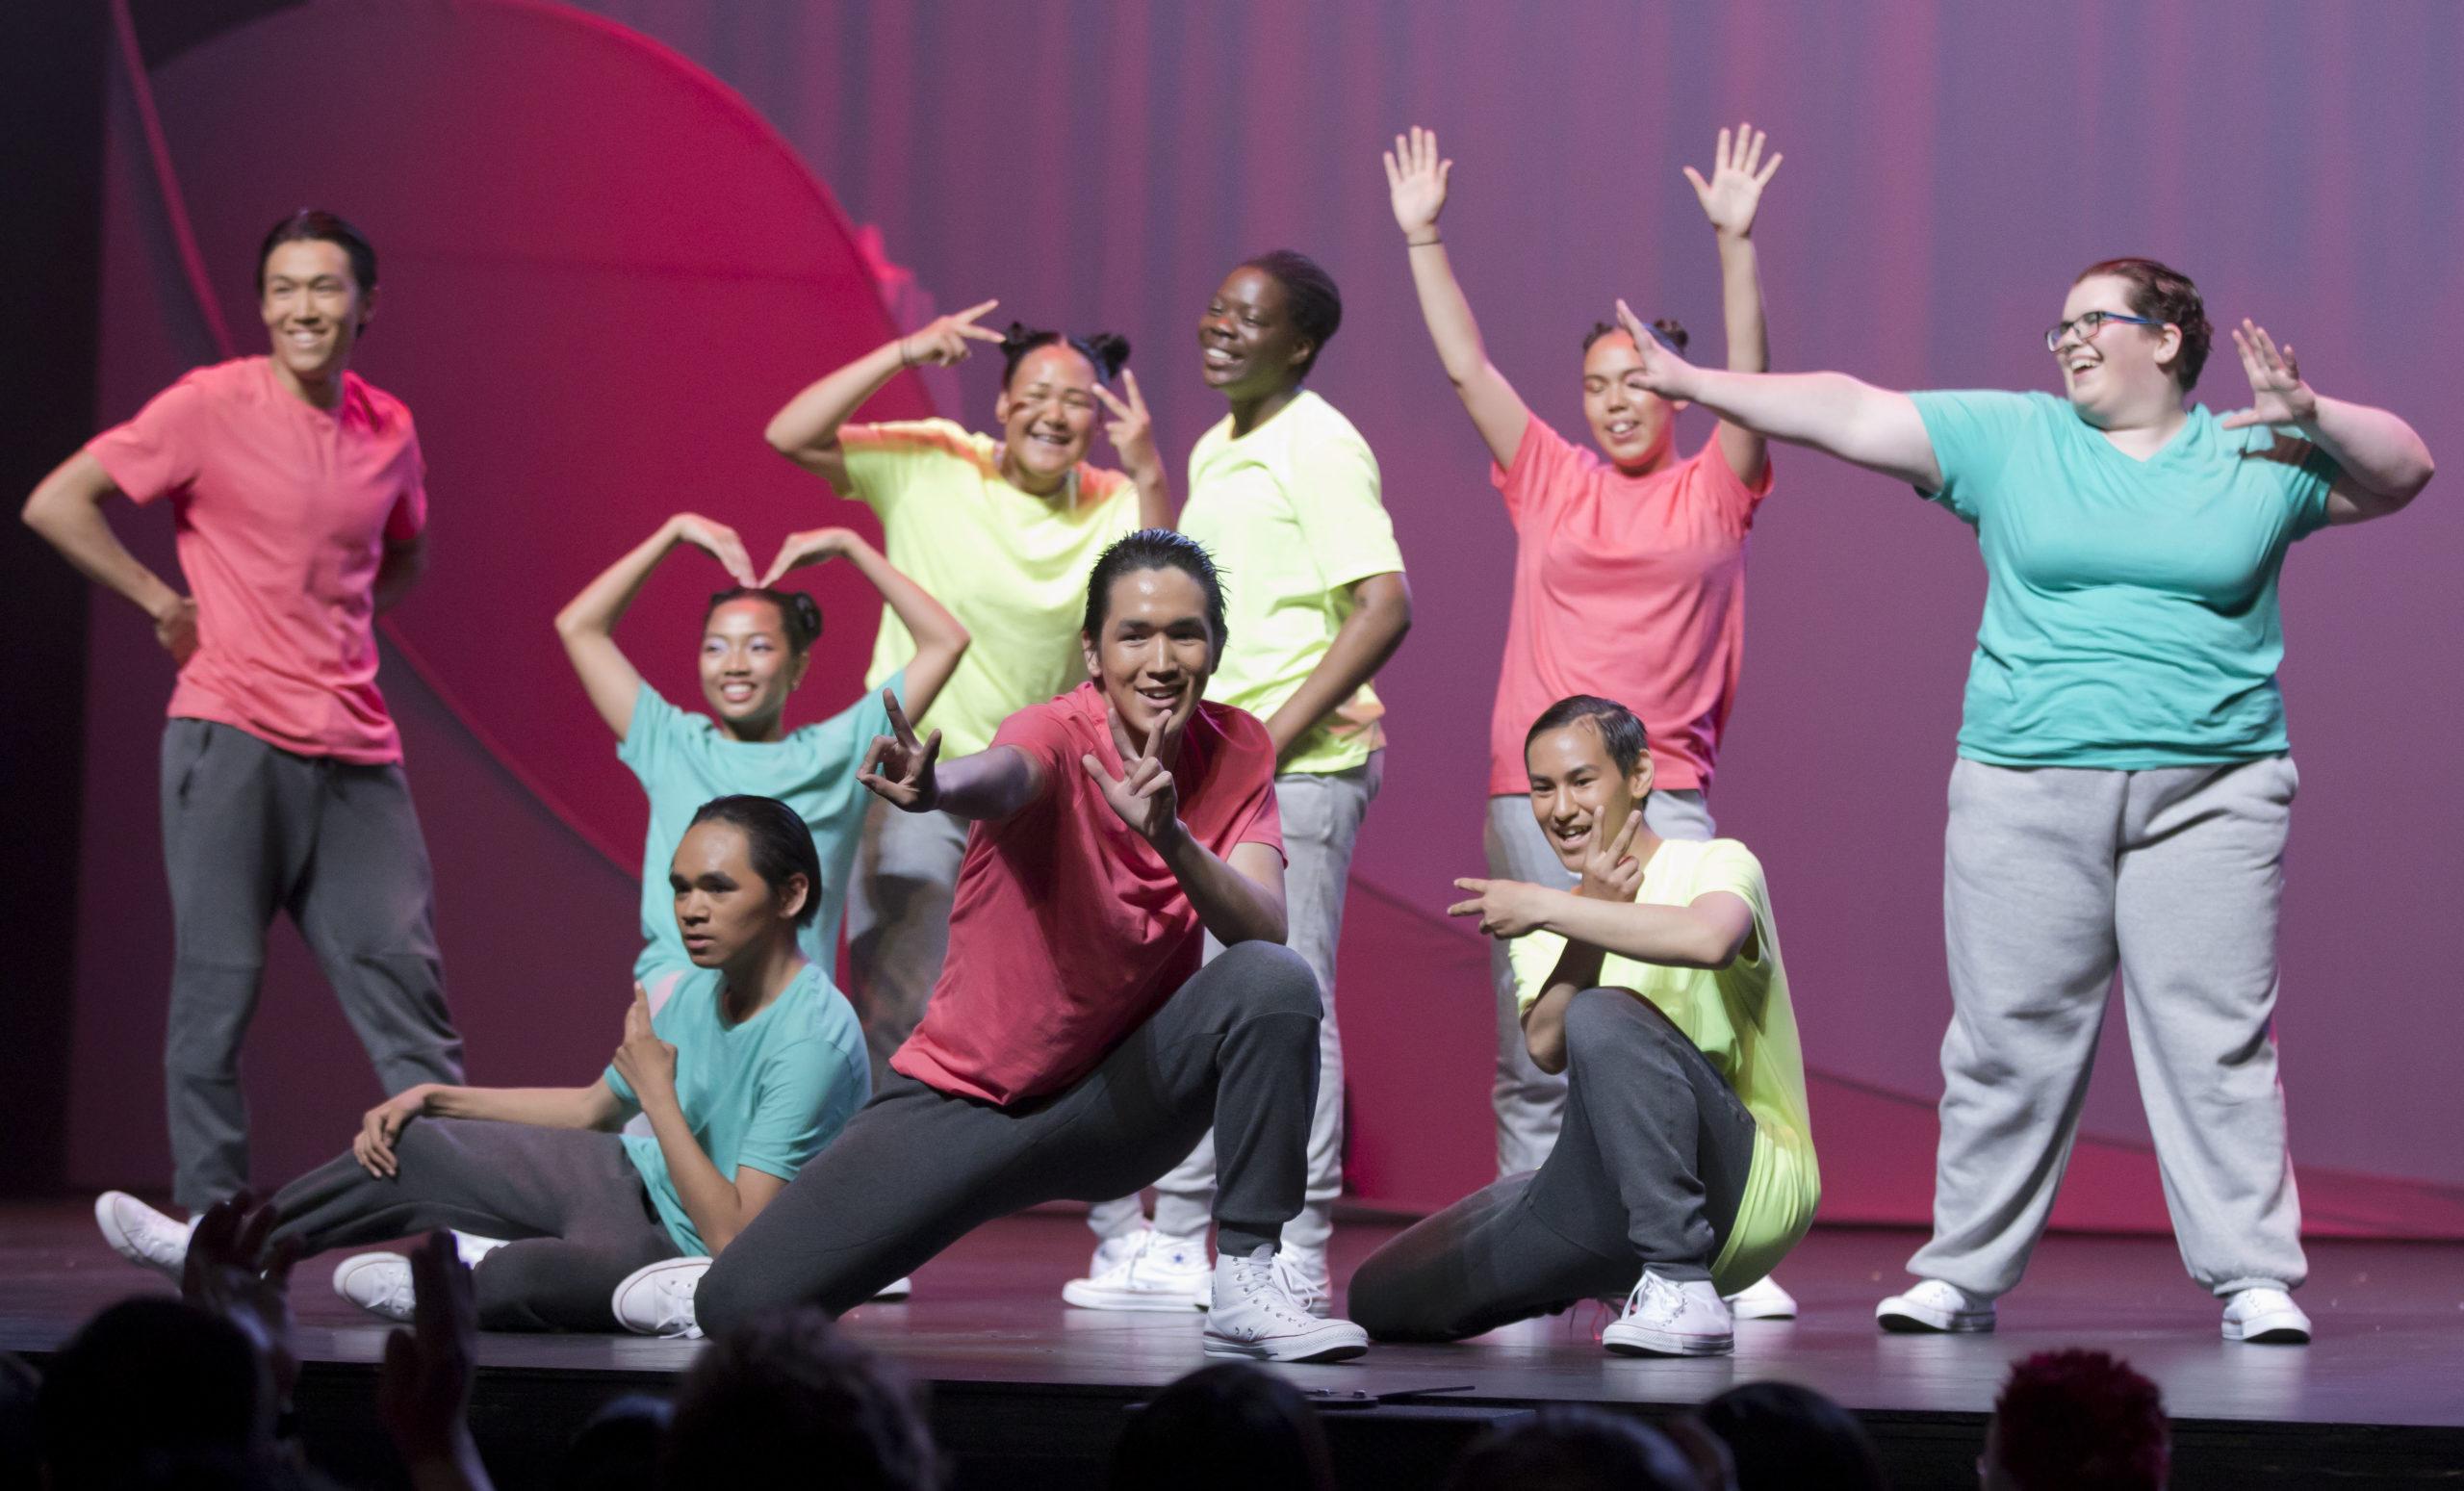 The OLI Effect – Inspiring Change through Dance